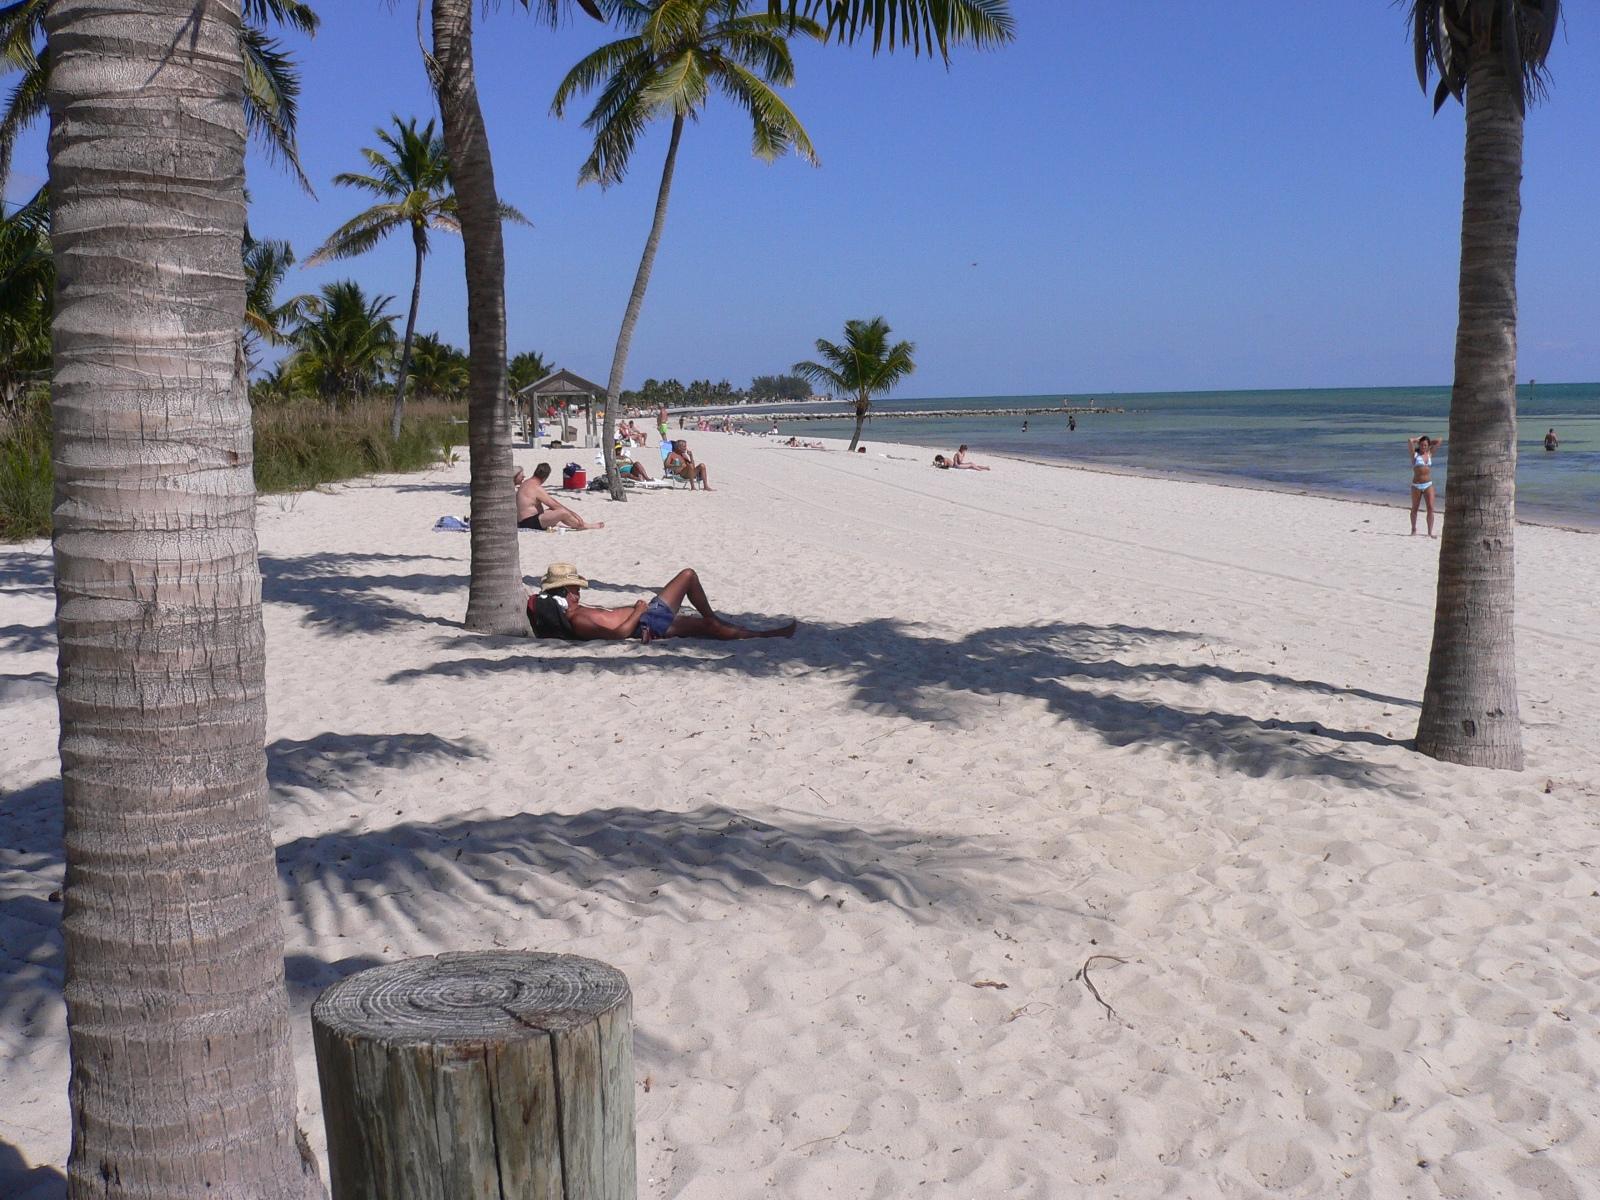 Glasbodenboot Touren in den Florida Keys - tour